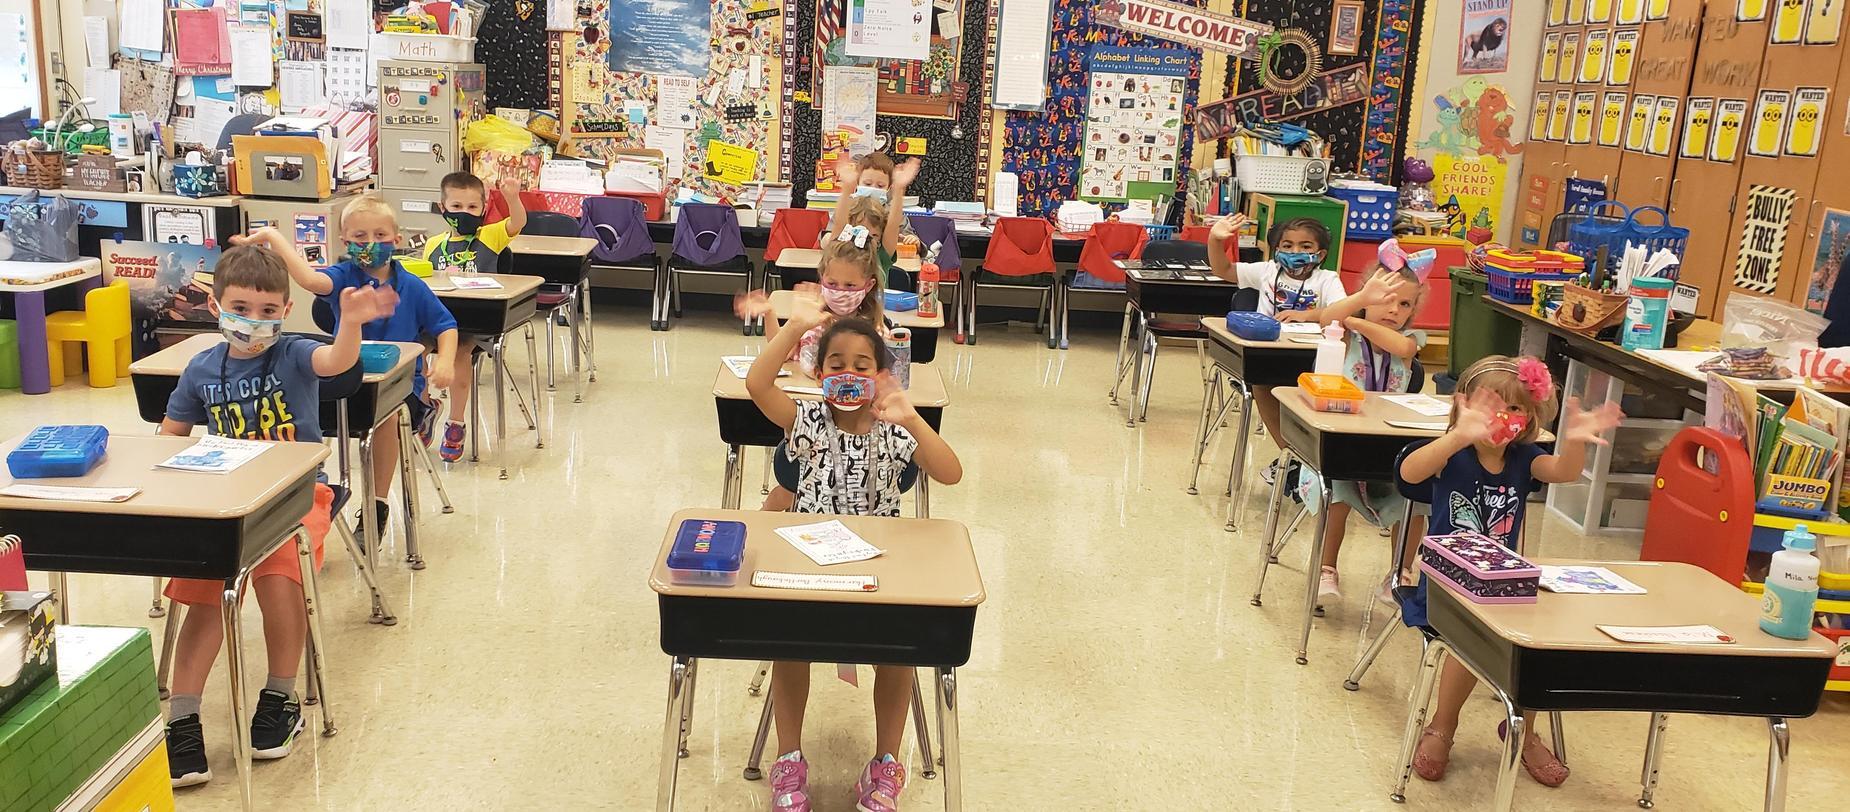 kindergarten students sitting at desks